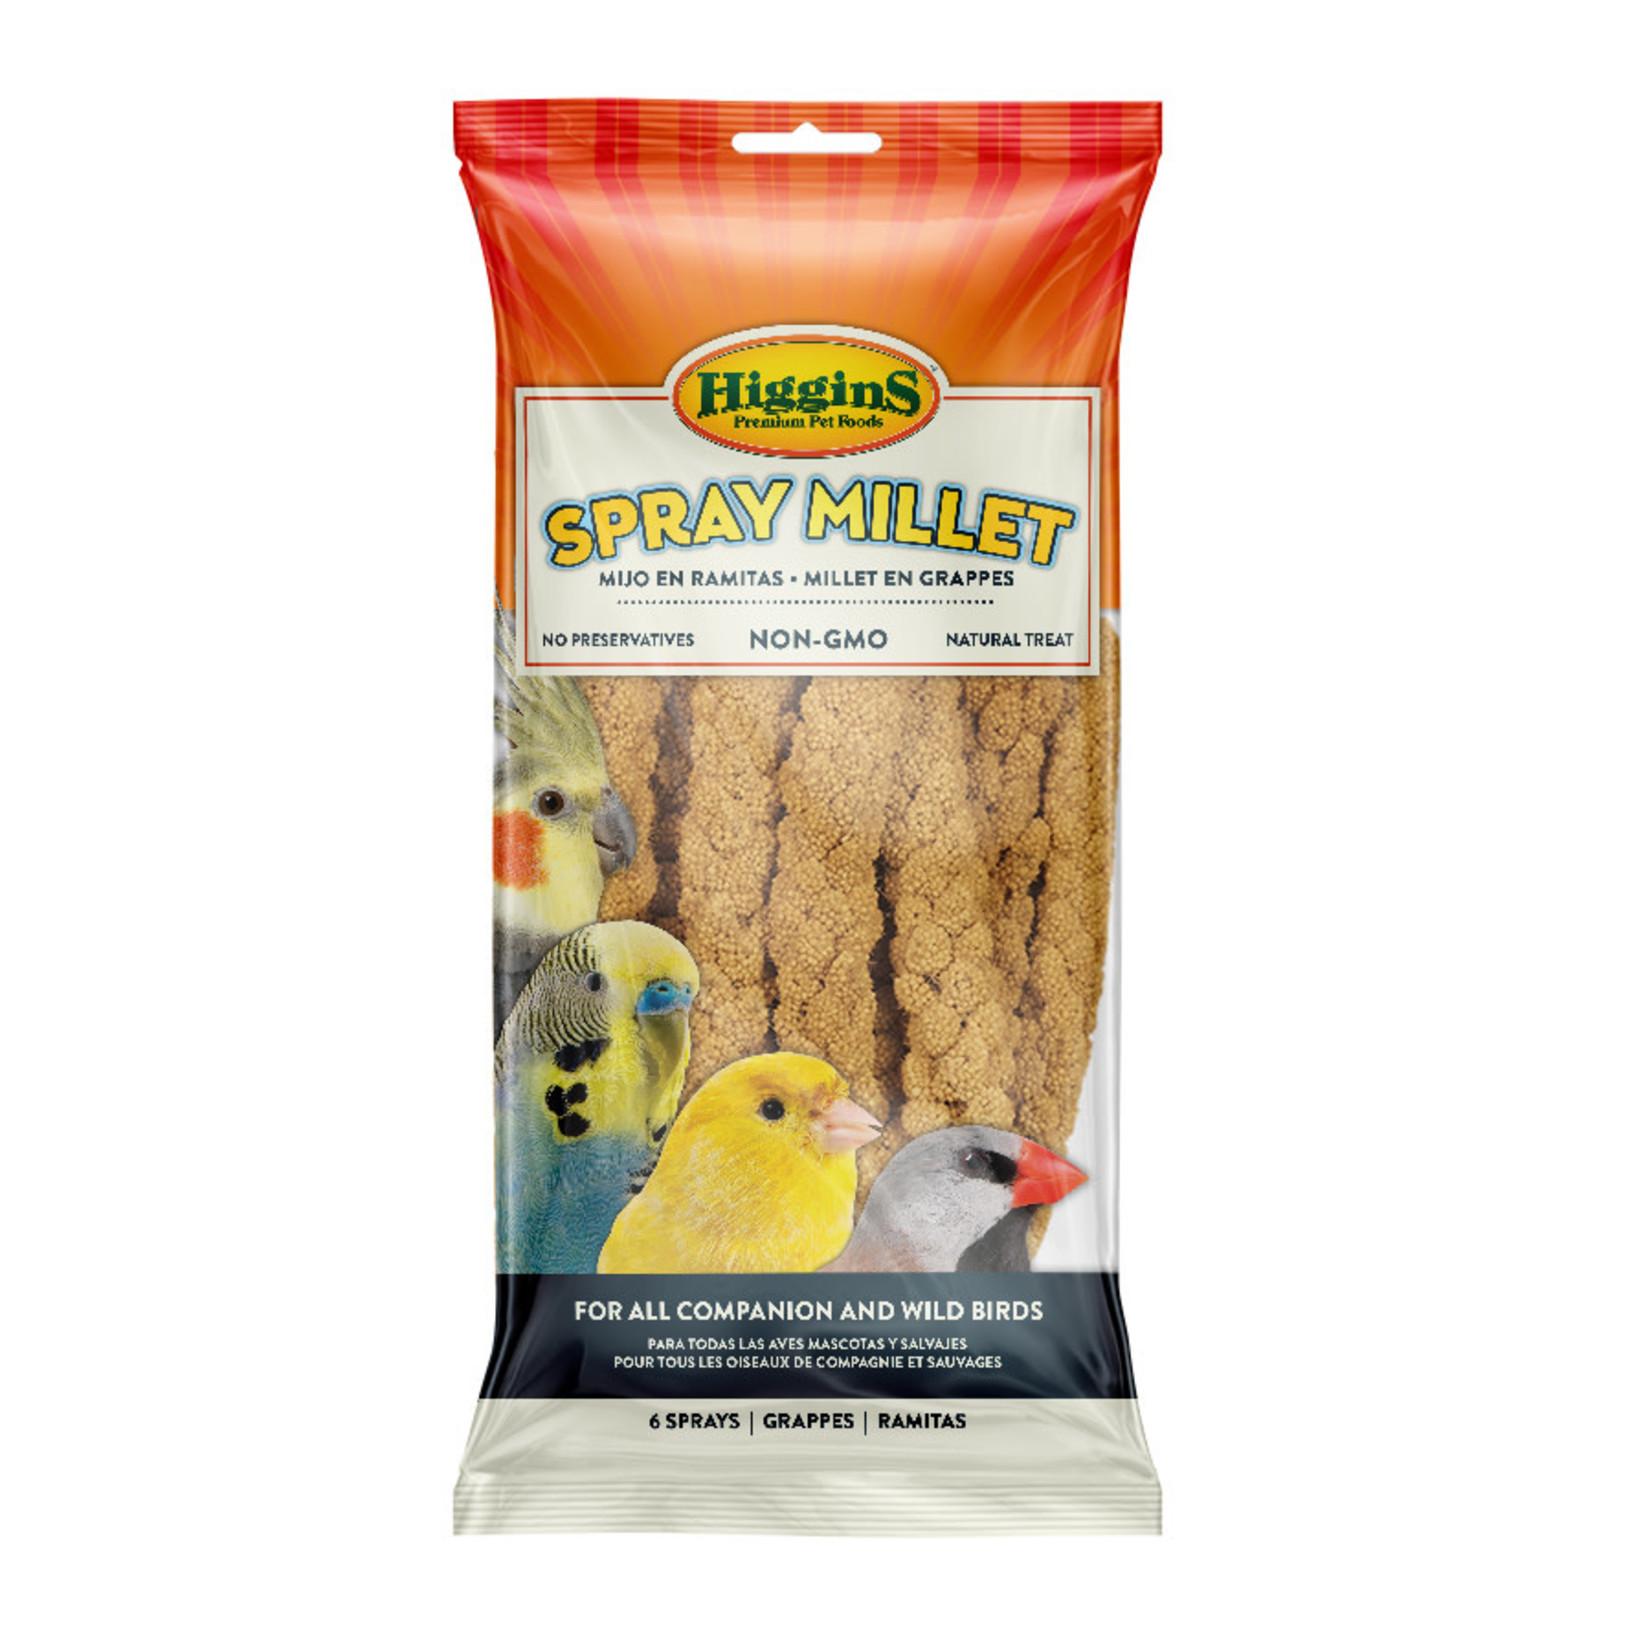 Spray Millet for All Companion & Wild Birds 6 Sprays